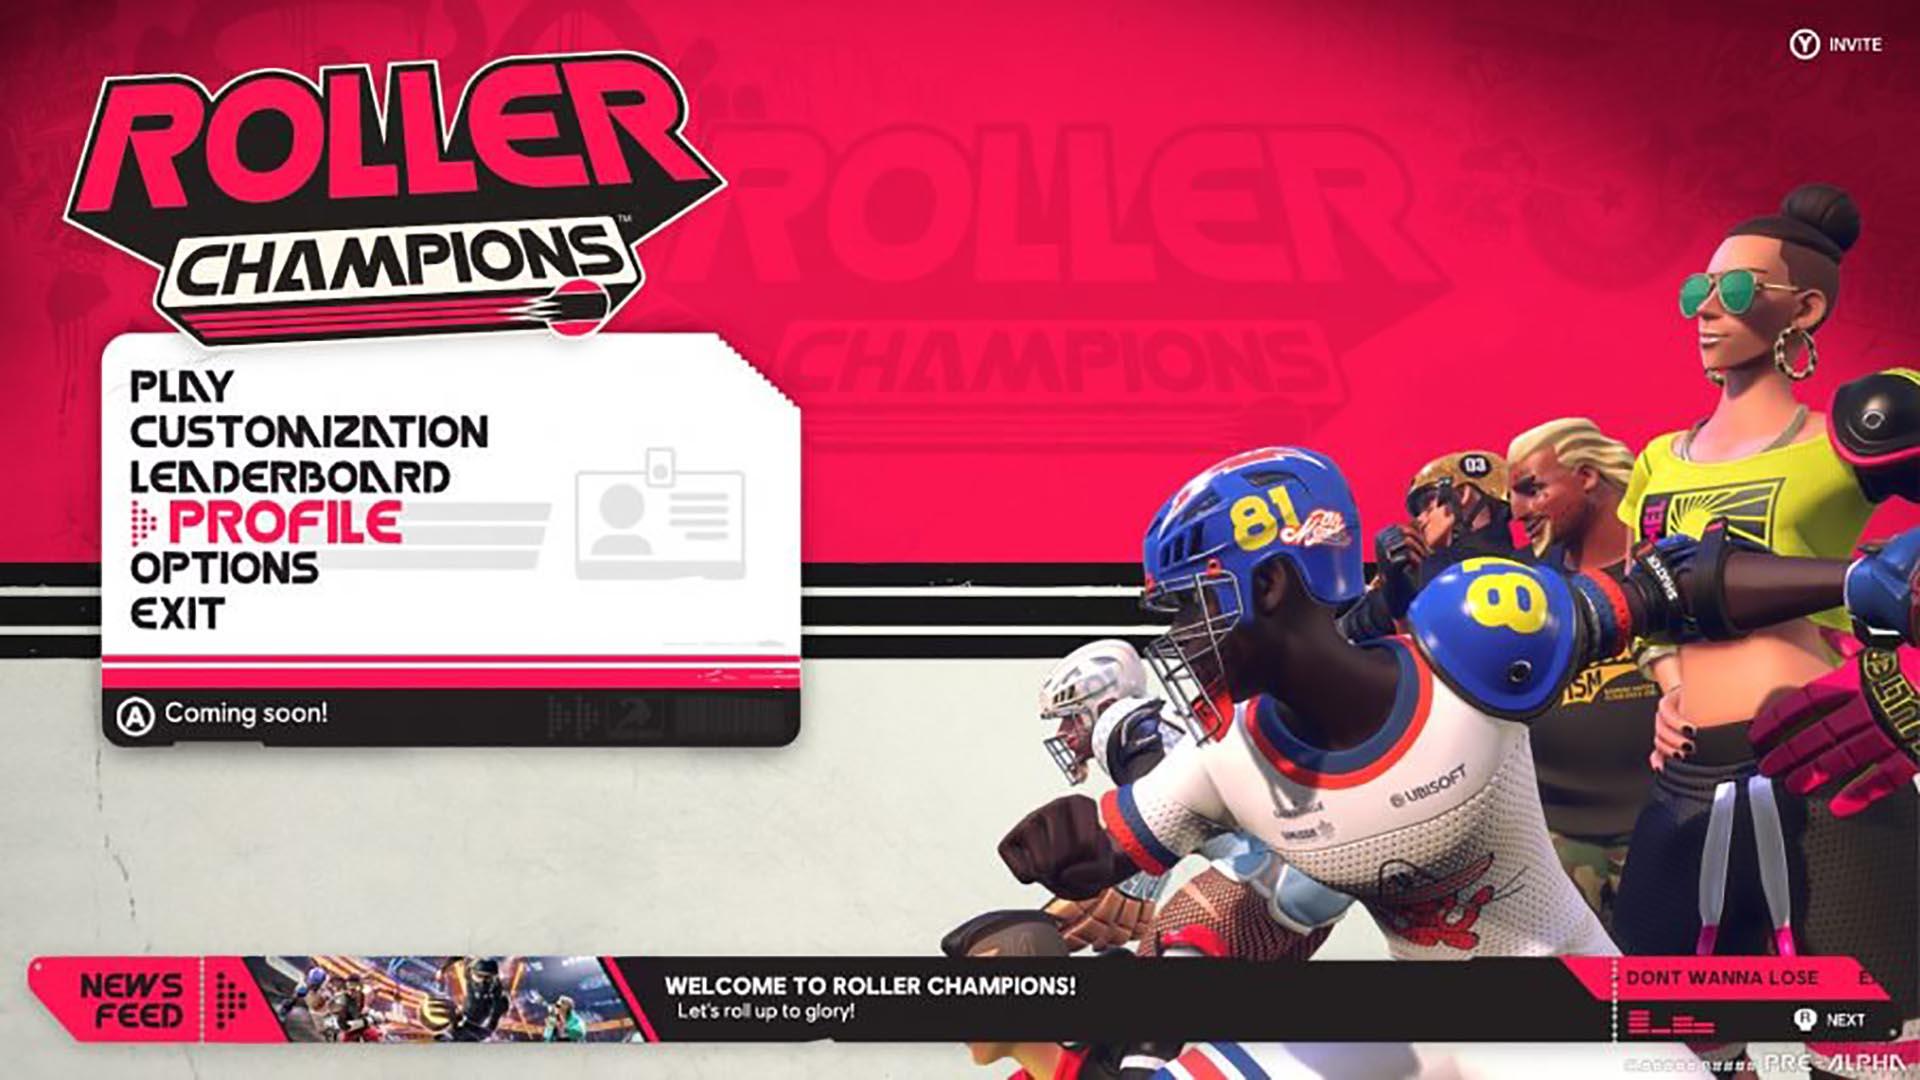 roller champions ubisoft montreal